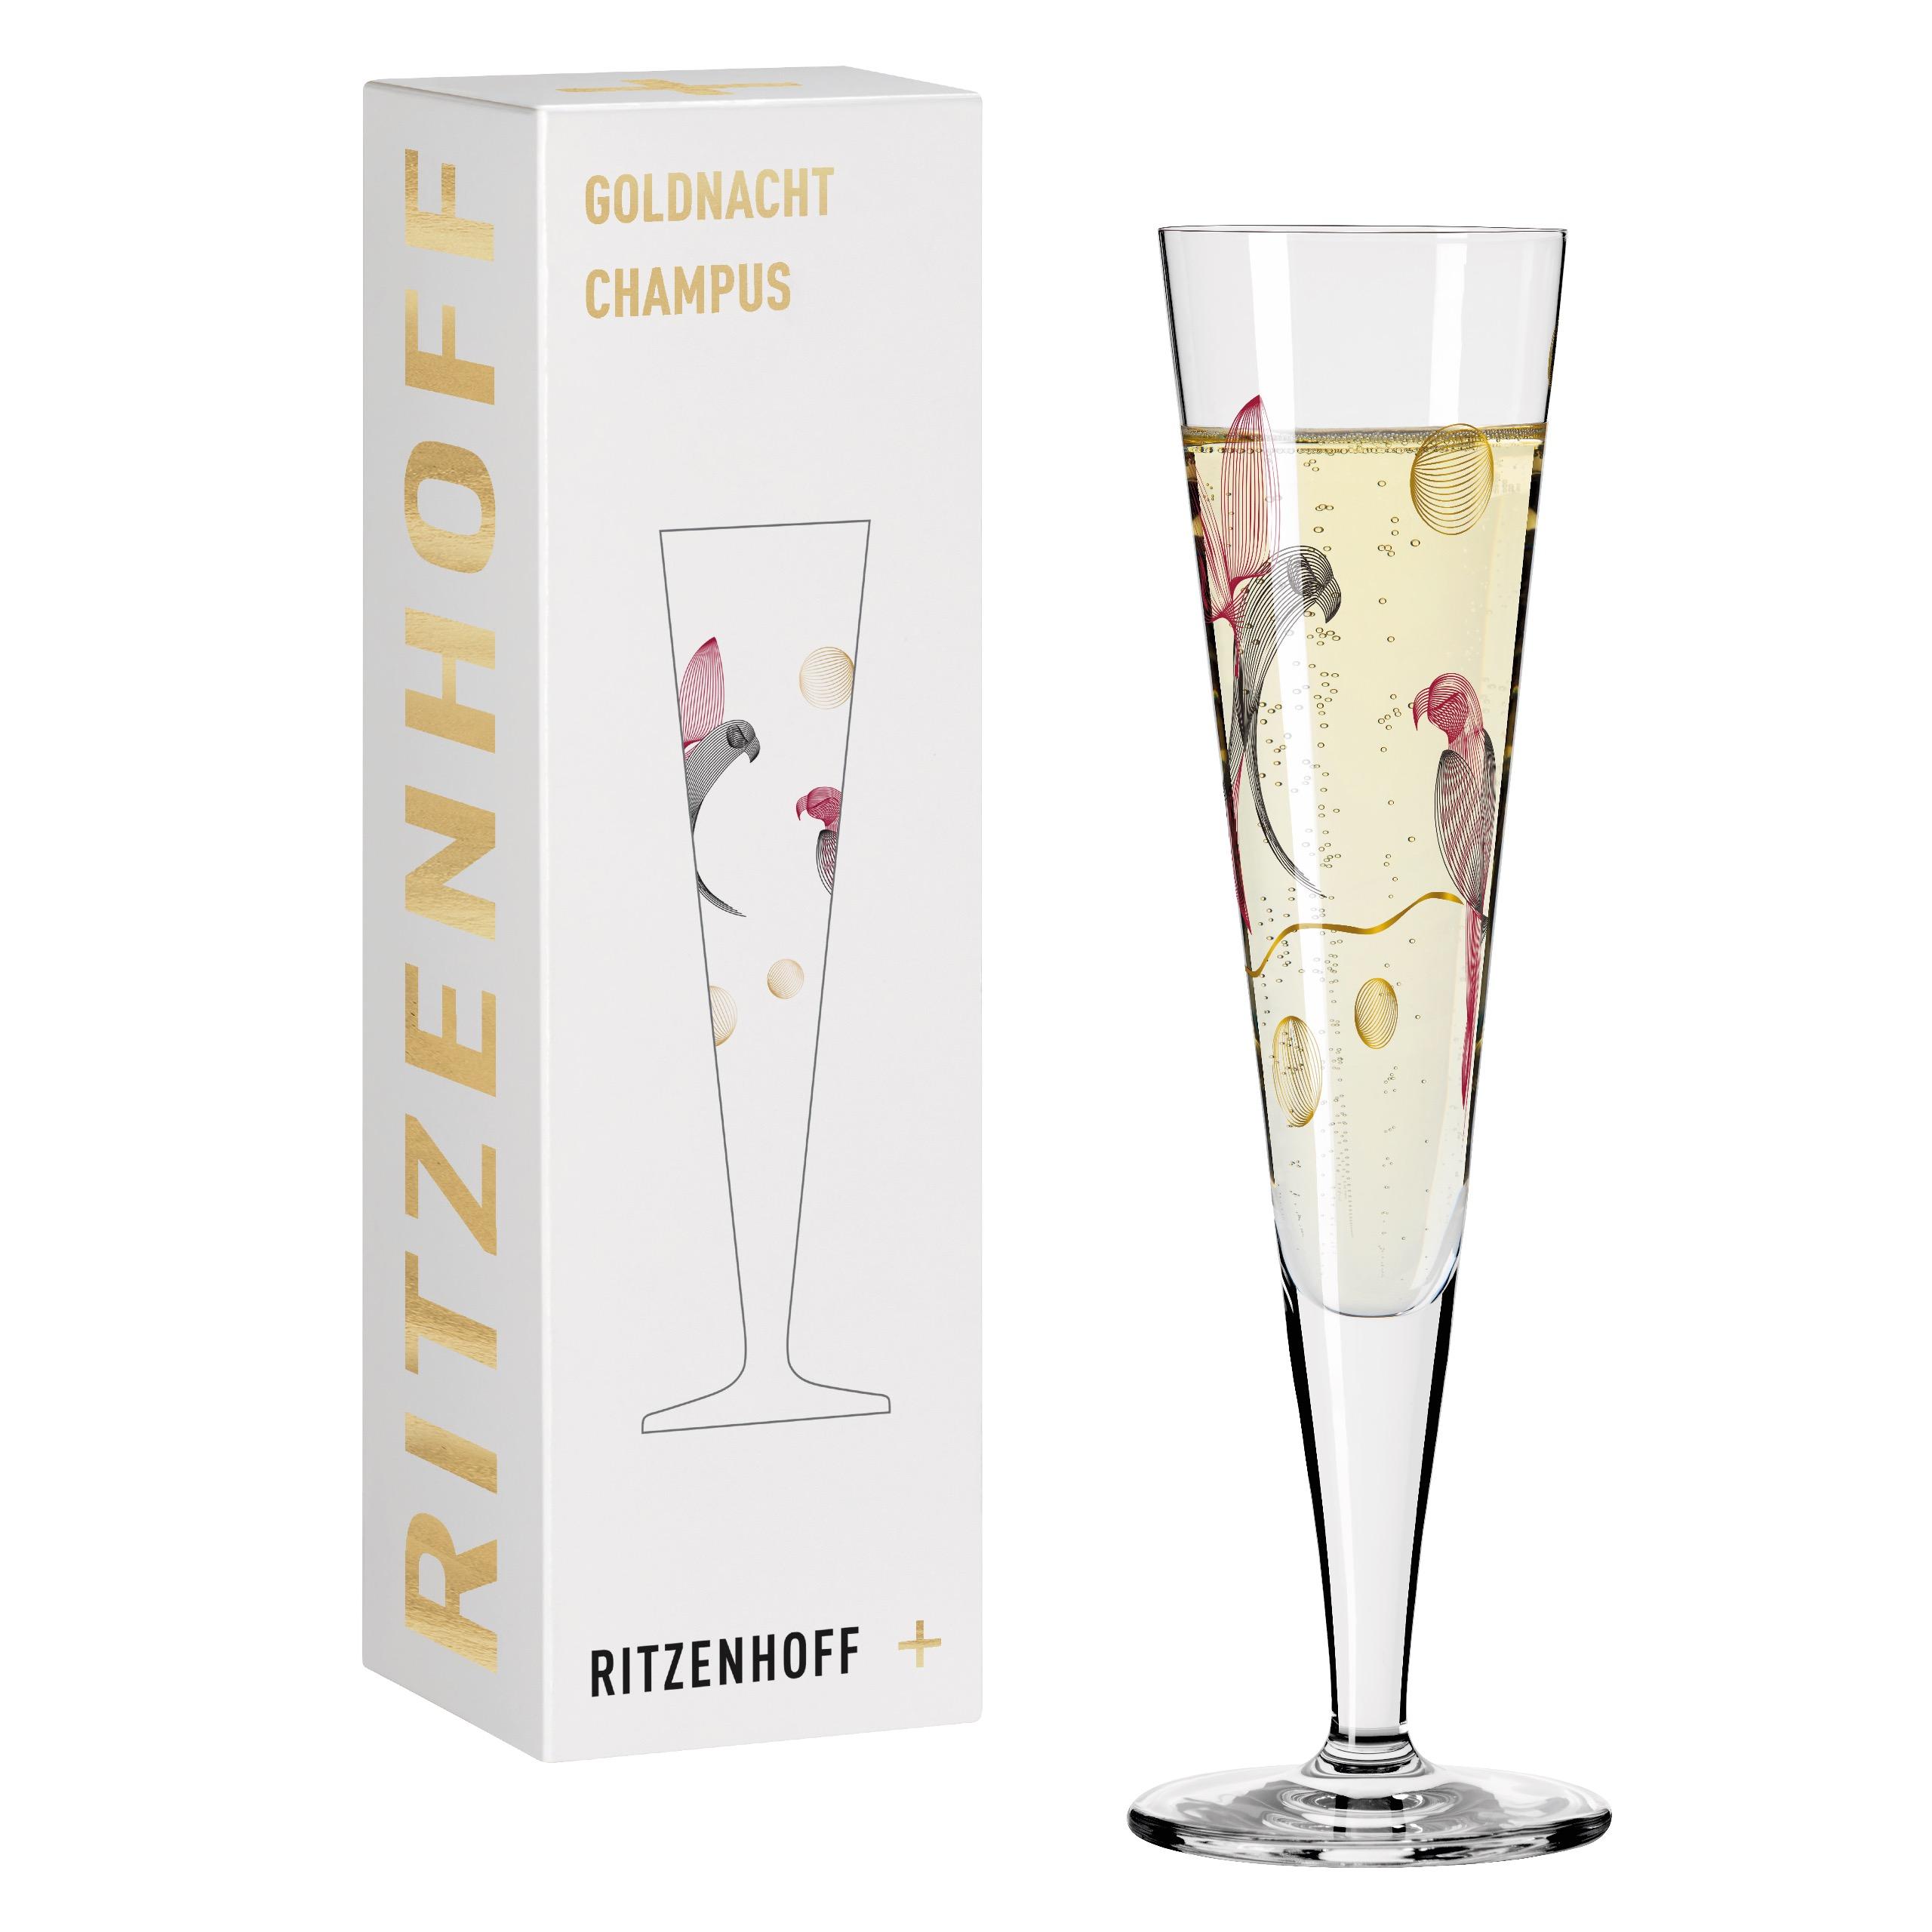 Ritzenhoff Goldnight Champagne Christine Korde